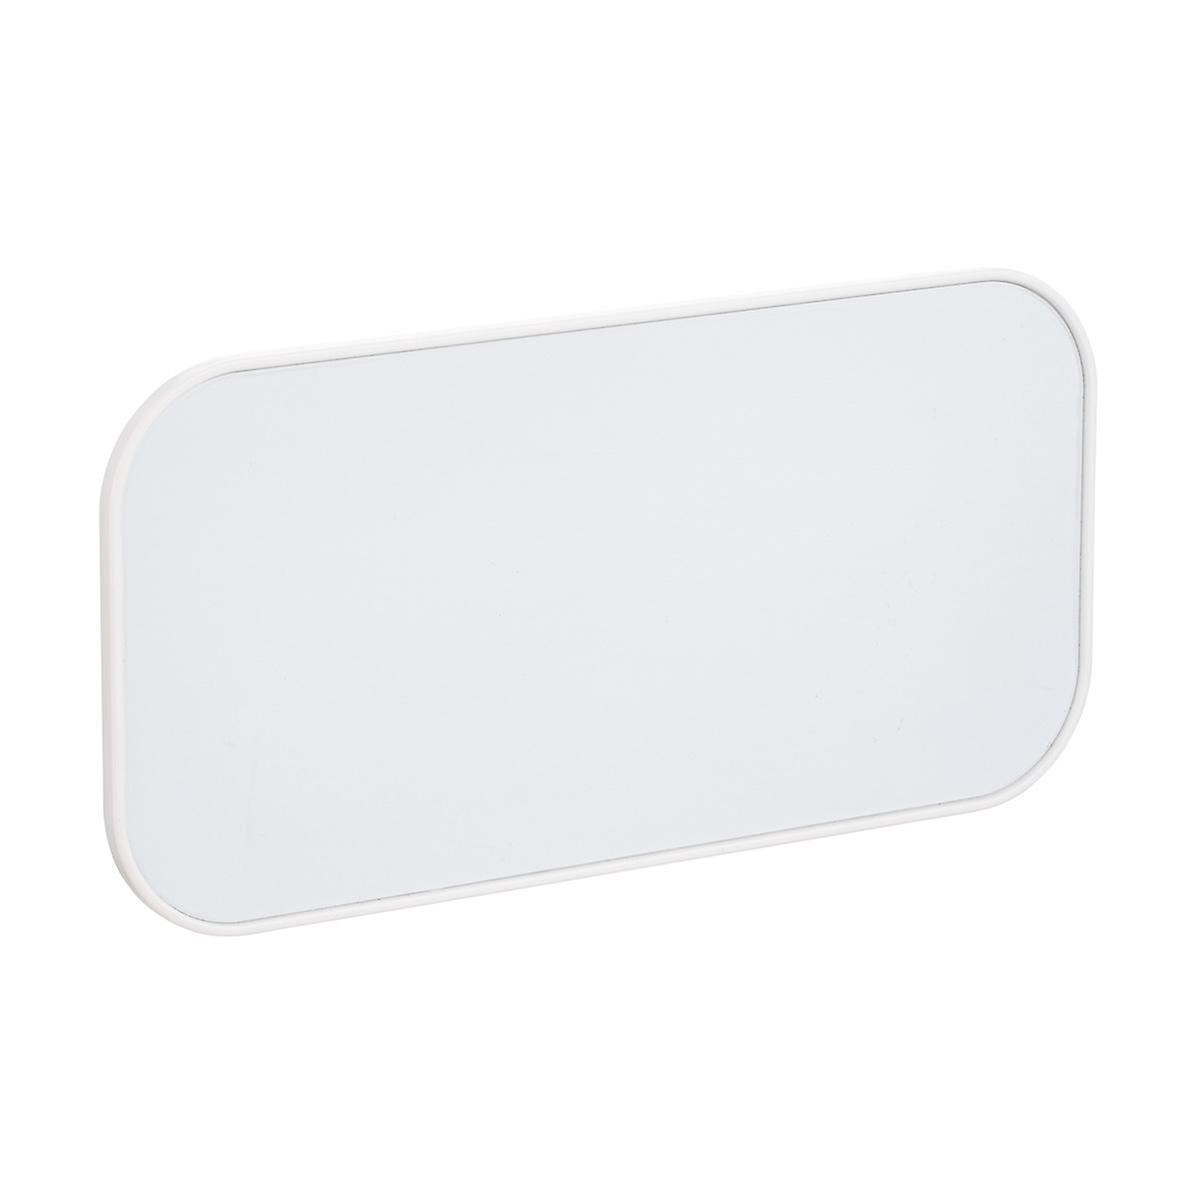 Perch Erasy Whiteboard